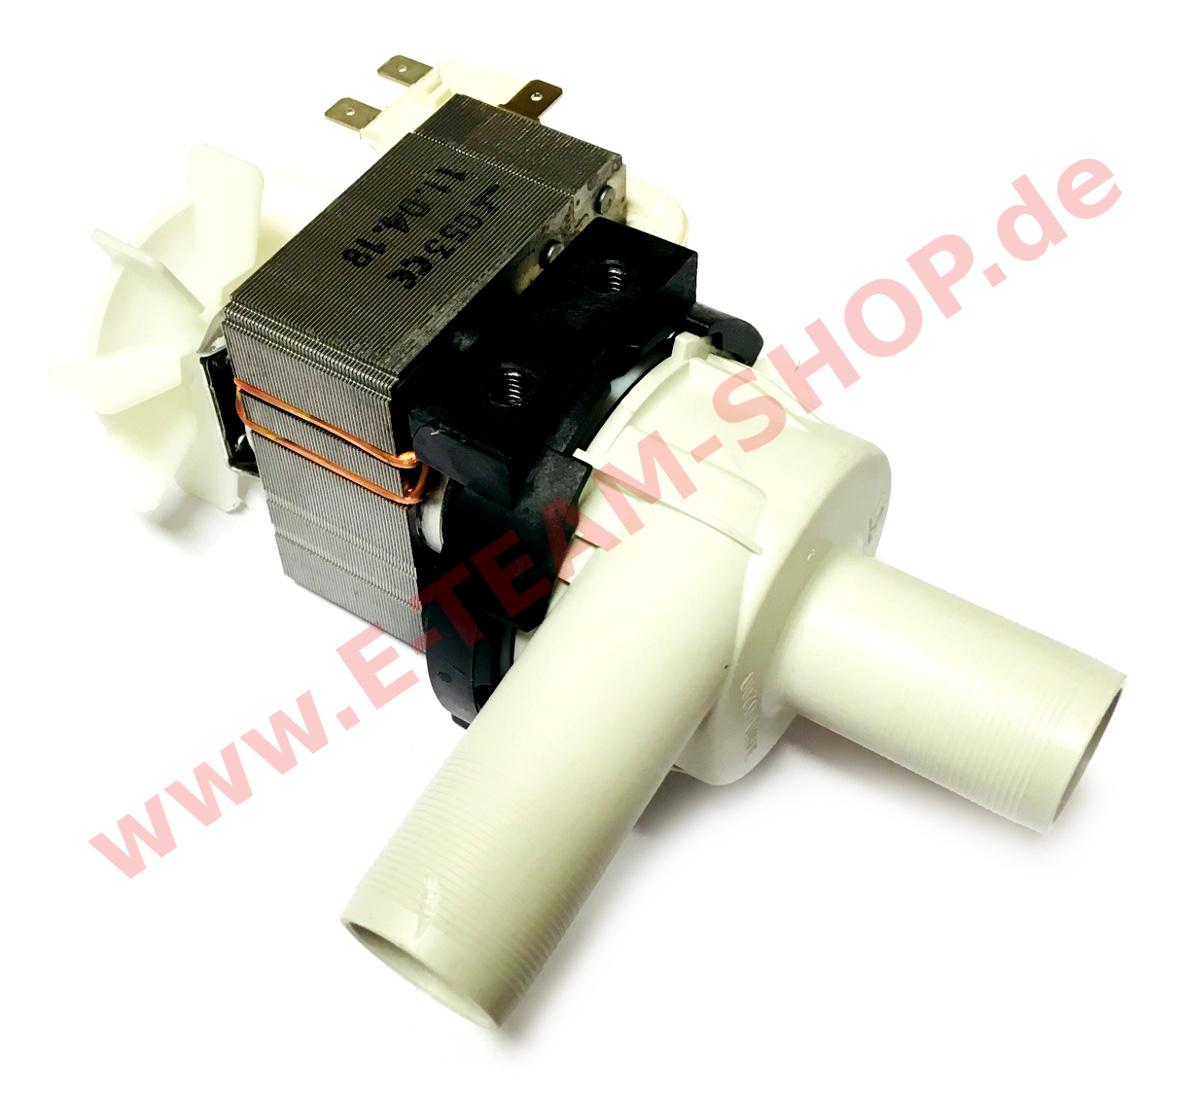 DV40T FA HANNING KD22B3-679 Ablaufpumpe für Spülmaschine Meiko FV40N FV28G